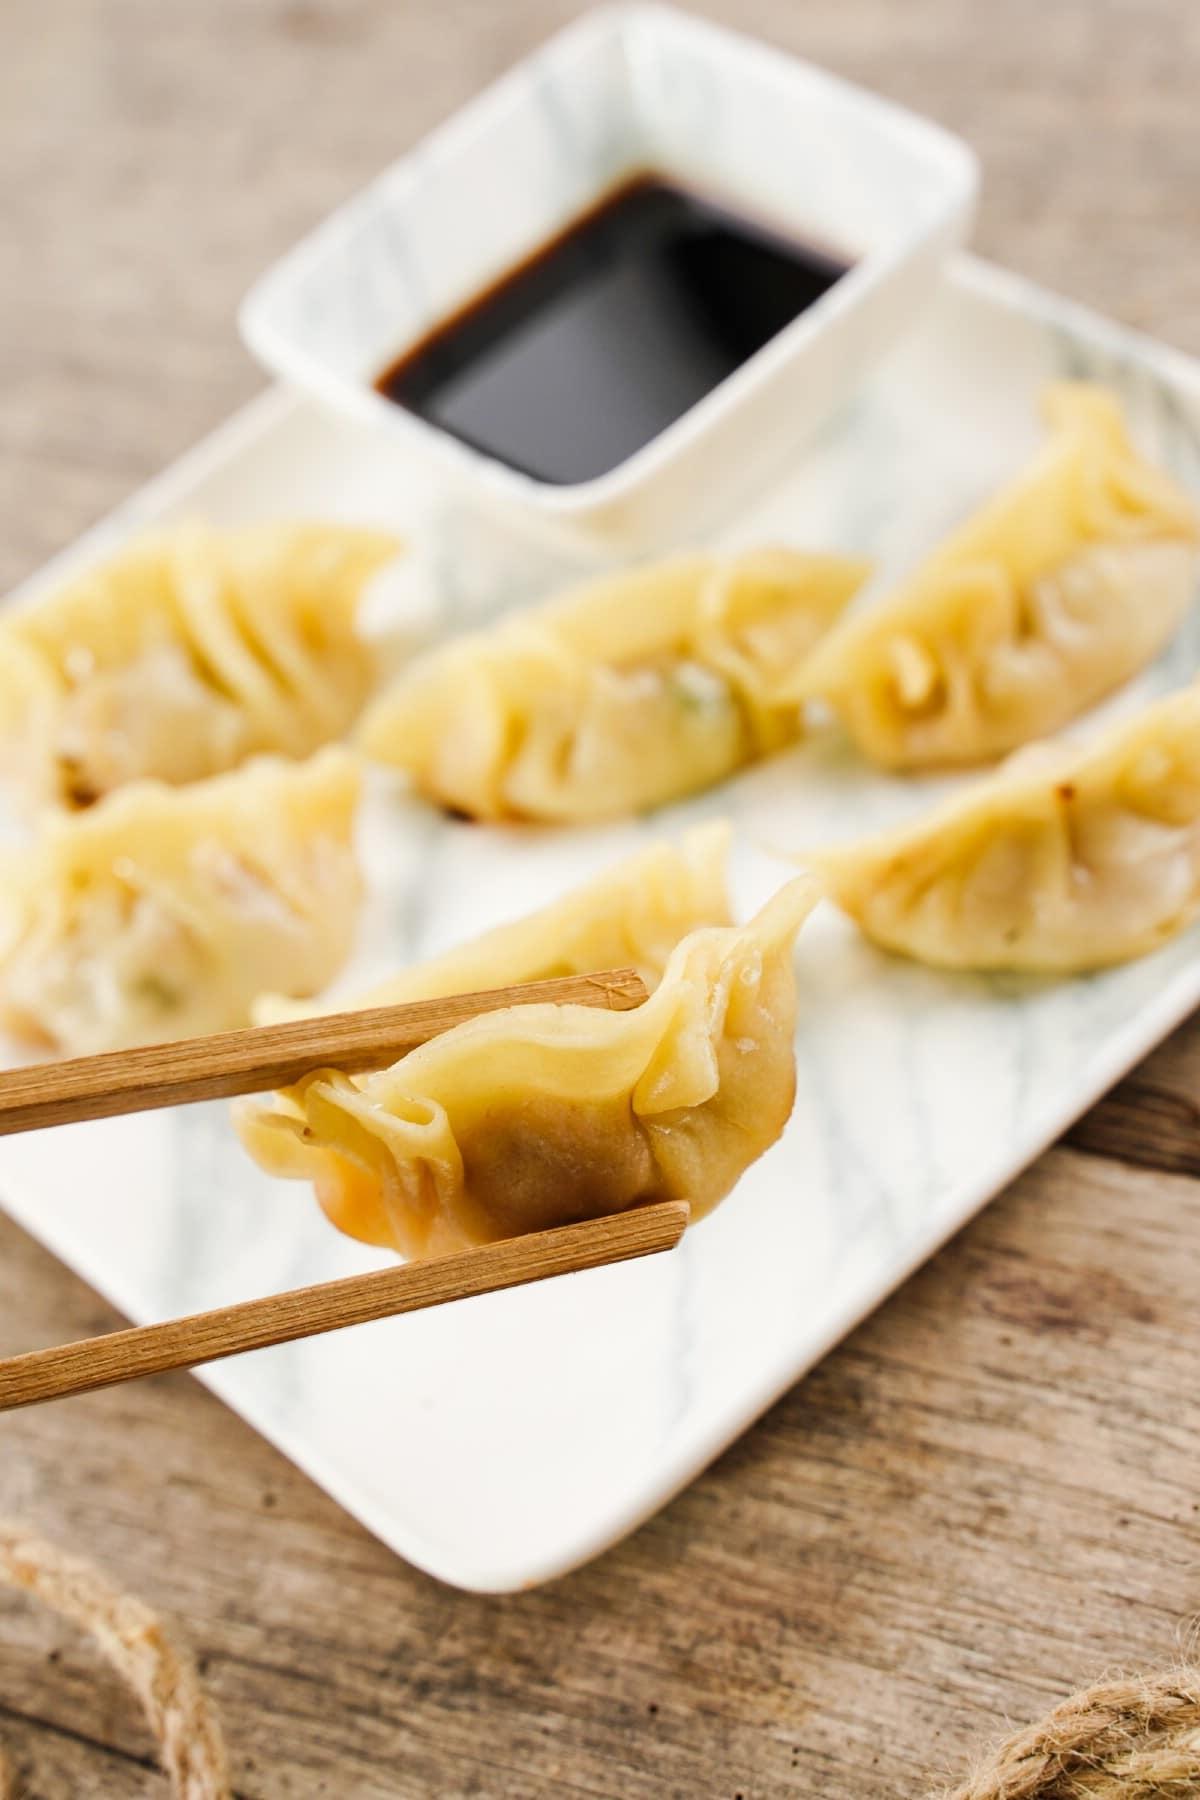 Wooden chopsticks holding dumpling up above white plate of cooked dumplings